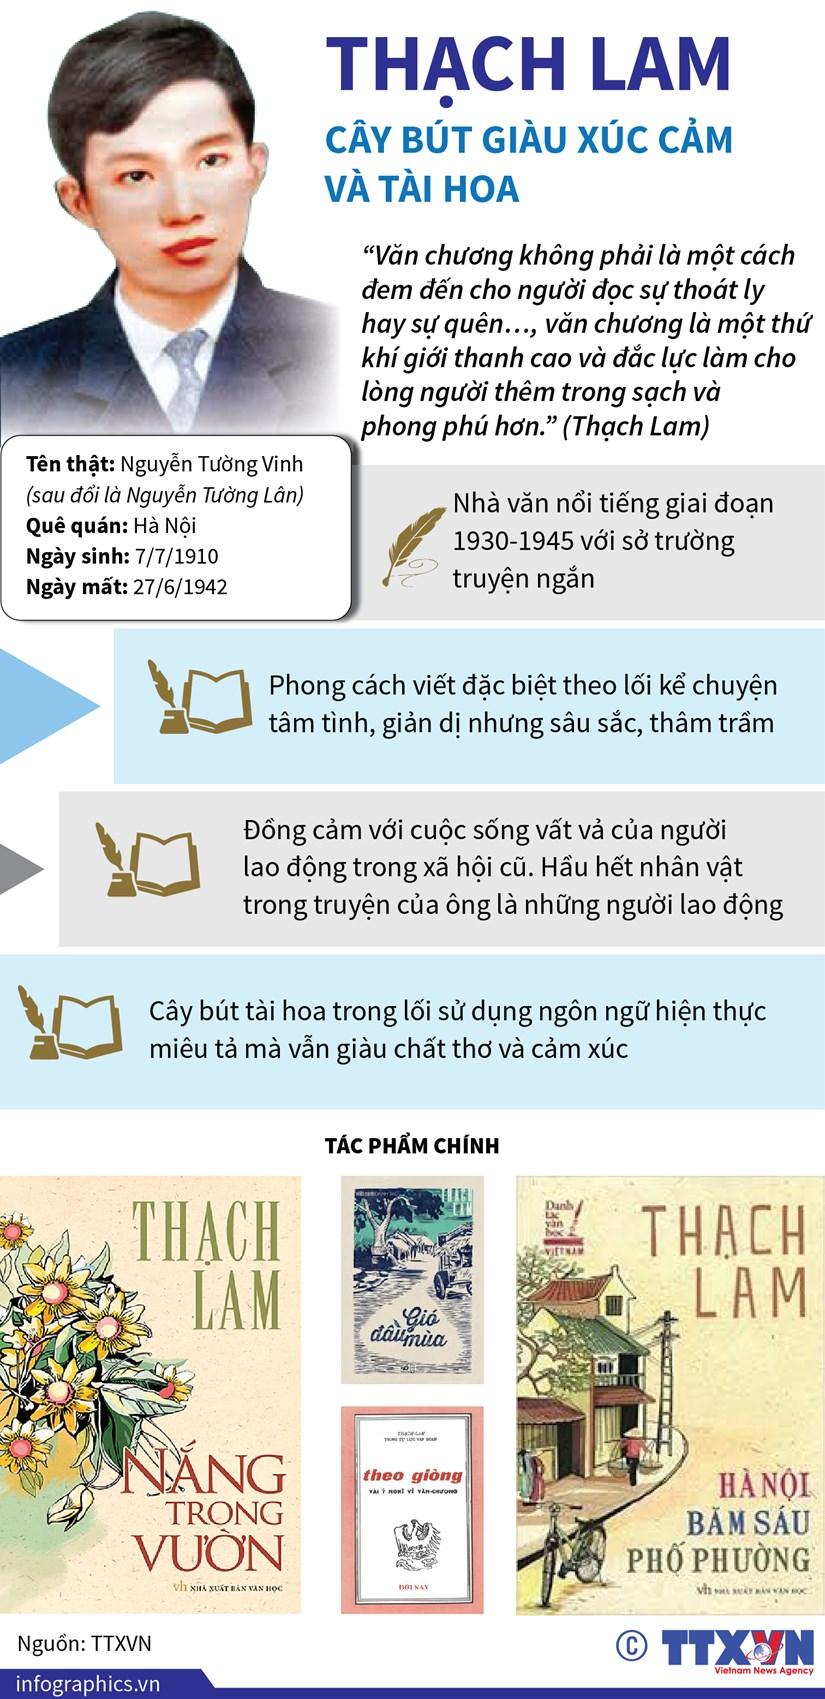 [Infographics] Thach Lam: Cay but giau xuc cam va tai hoa hinh anh 1